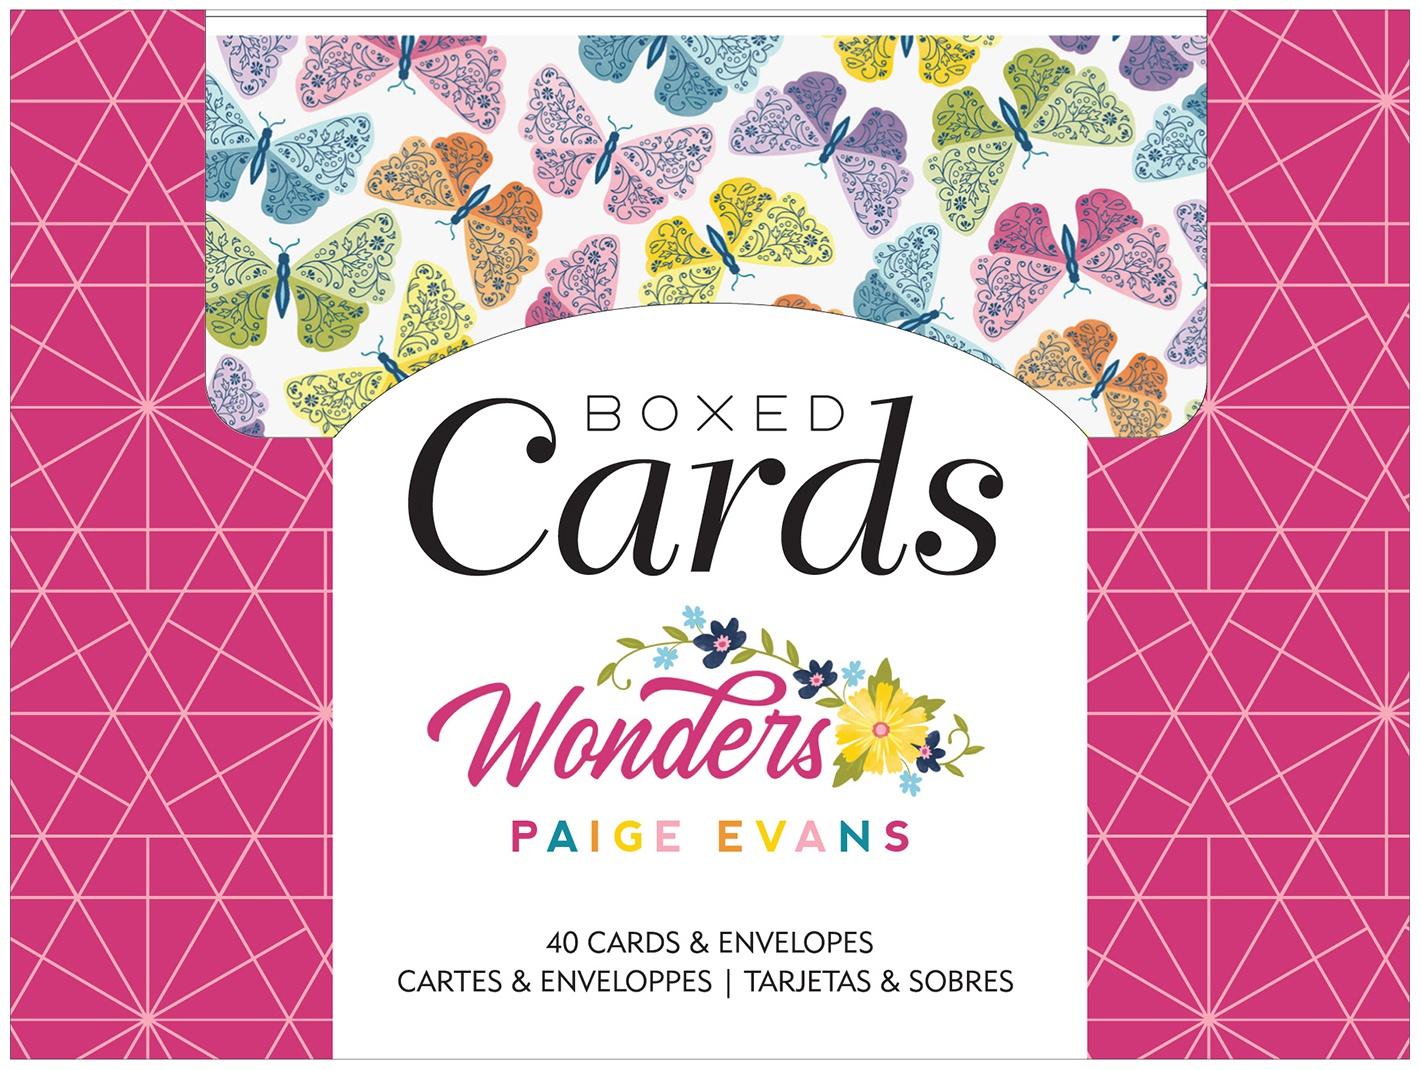 American Crafts A2 Cards W/Envelopes (4.375X5.75) 40/Box-Paige Evans Wonders